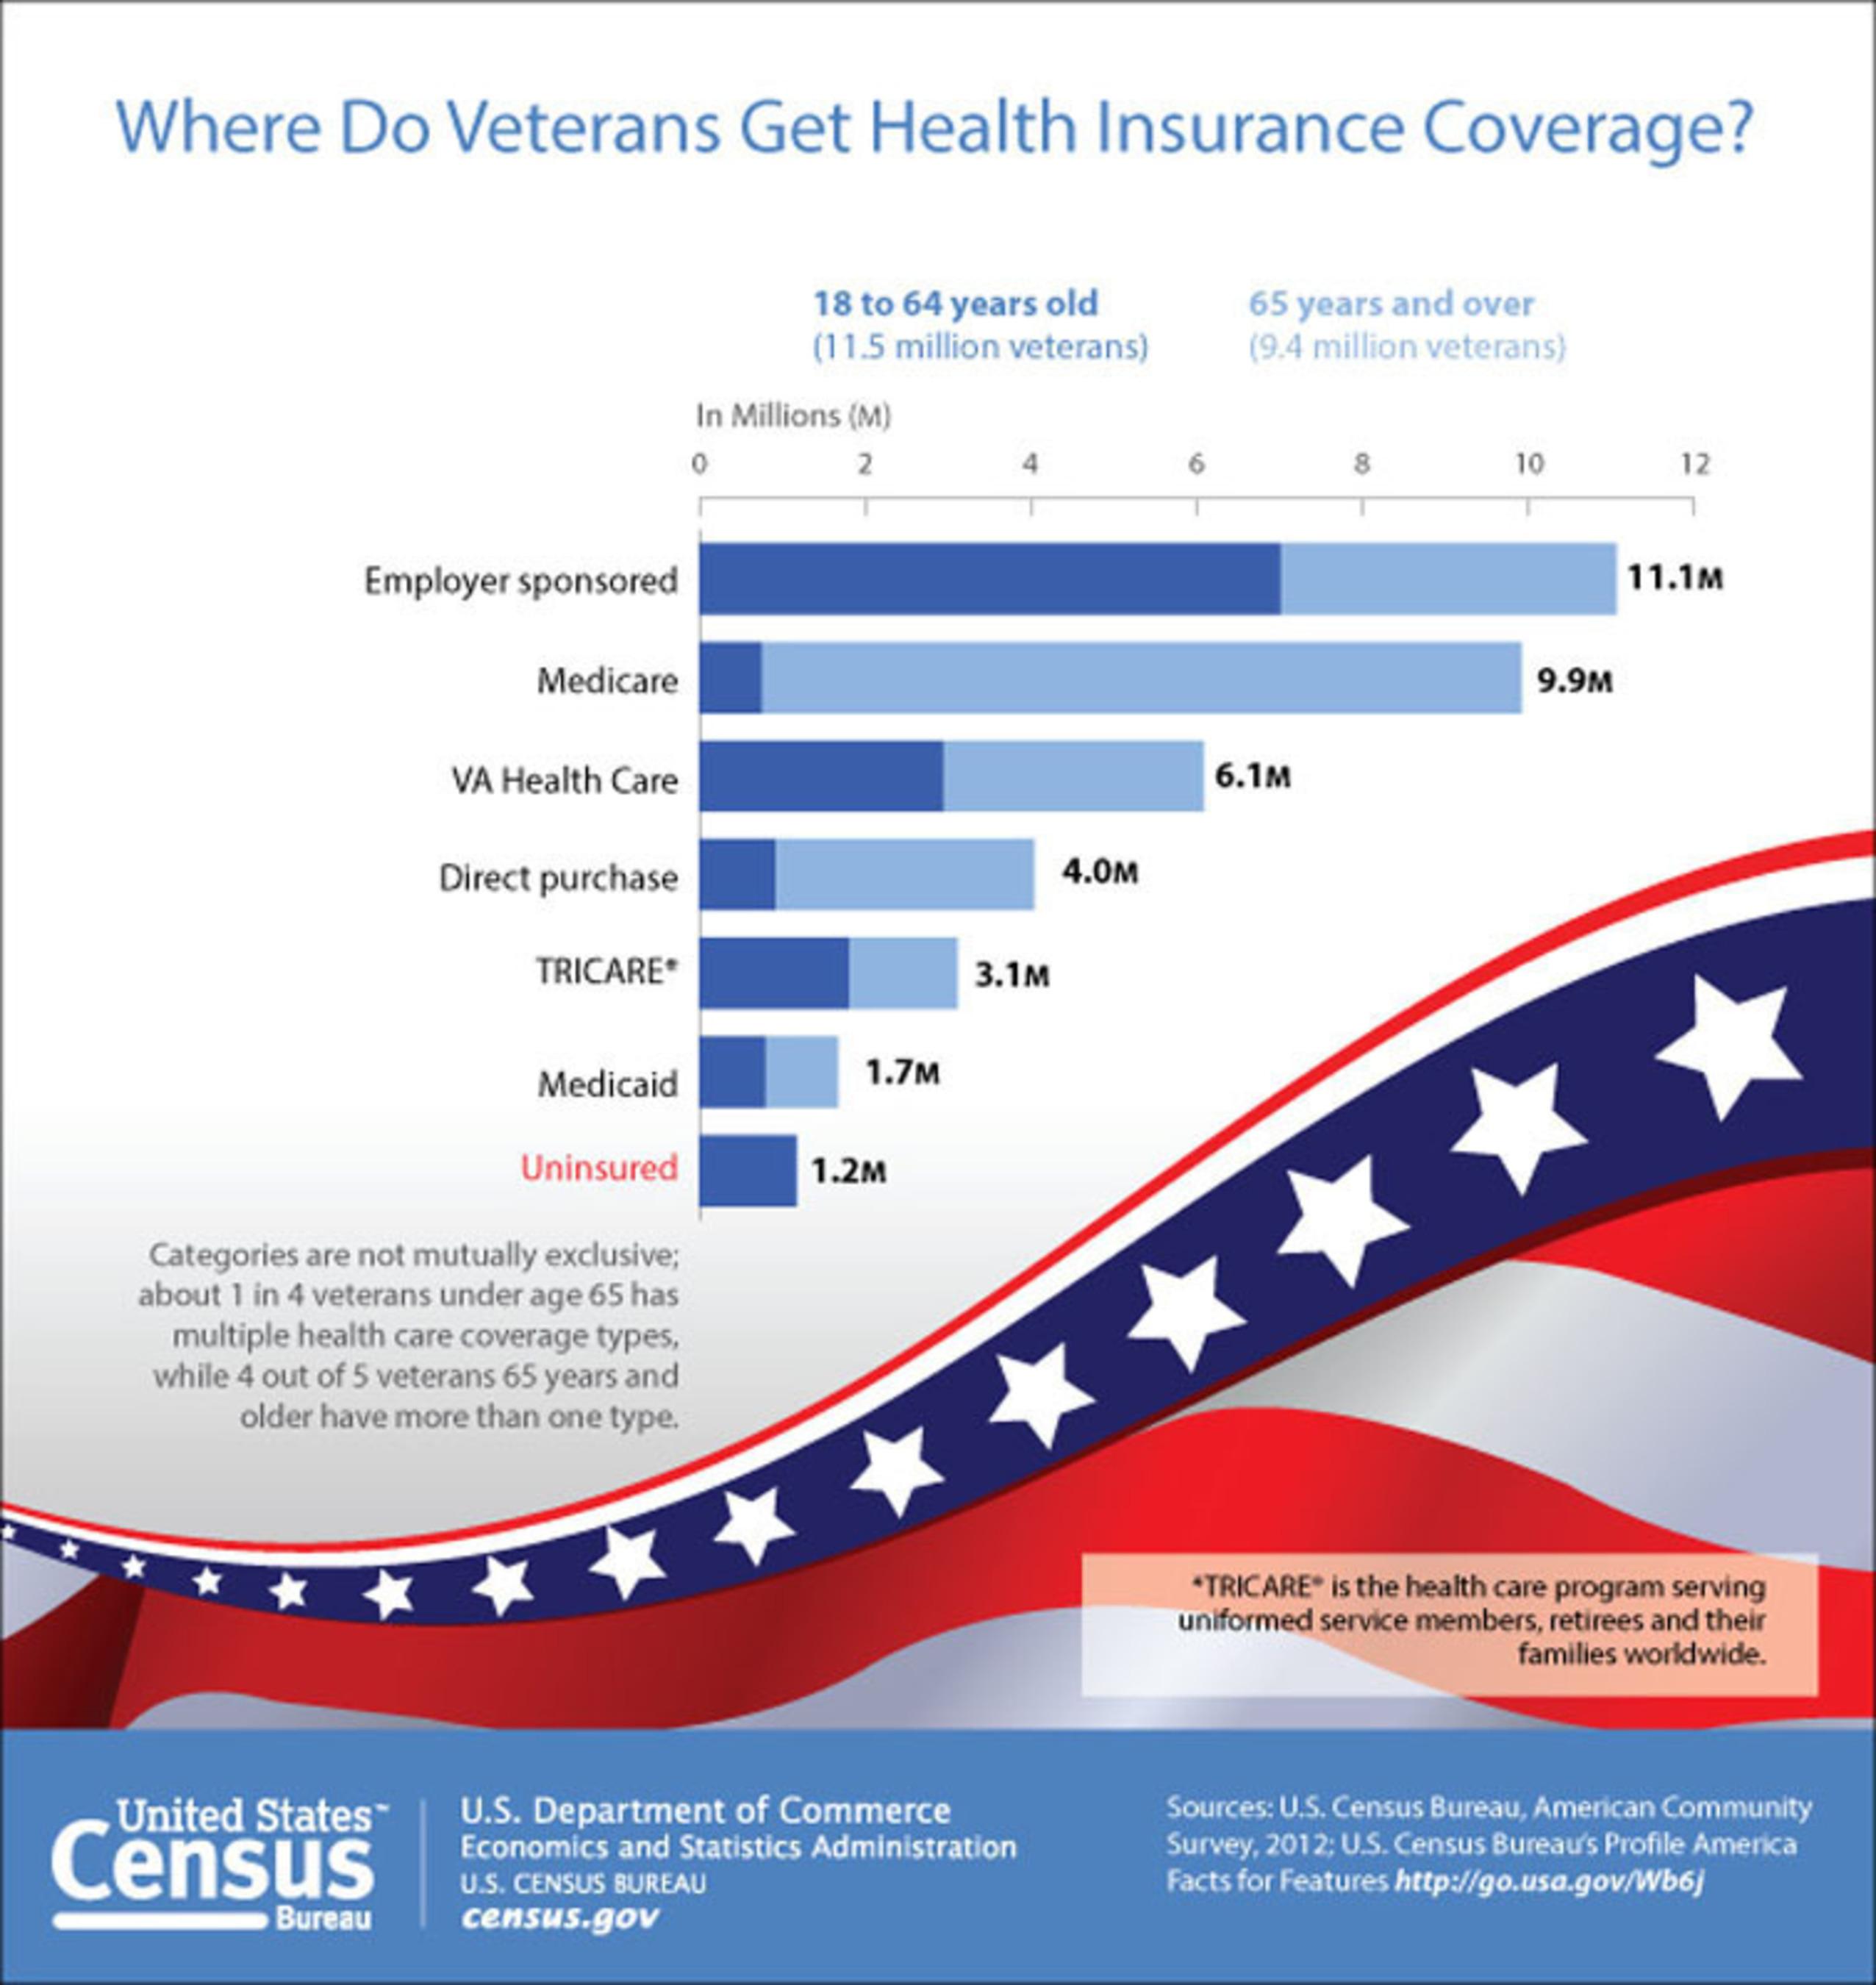 revised u s census bureau facts for features veterans day 2013 nov 11 washington nov 8. Black Bedroom Furniture Sets. Home Design Ideas